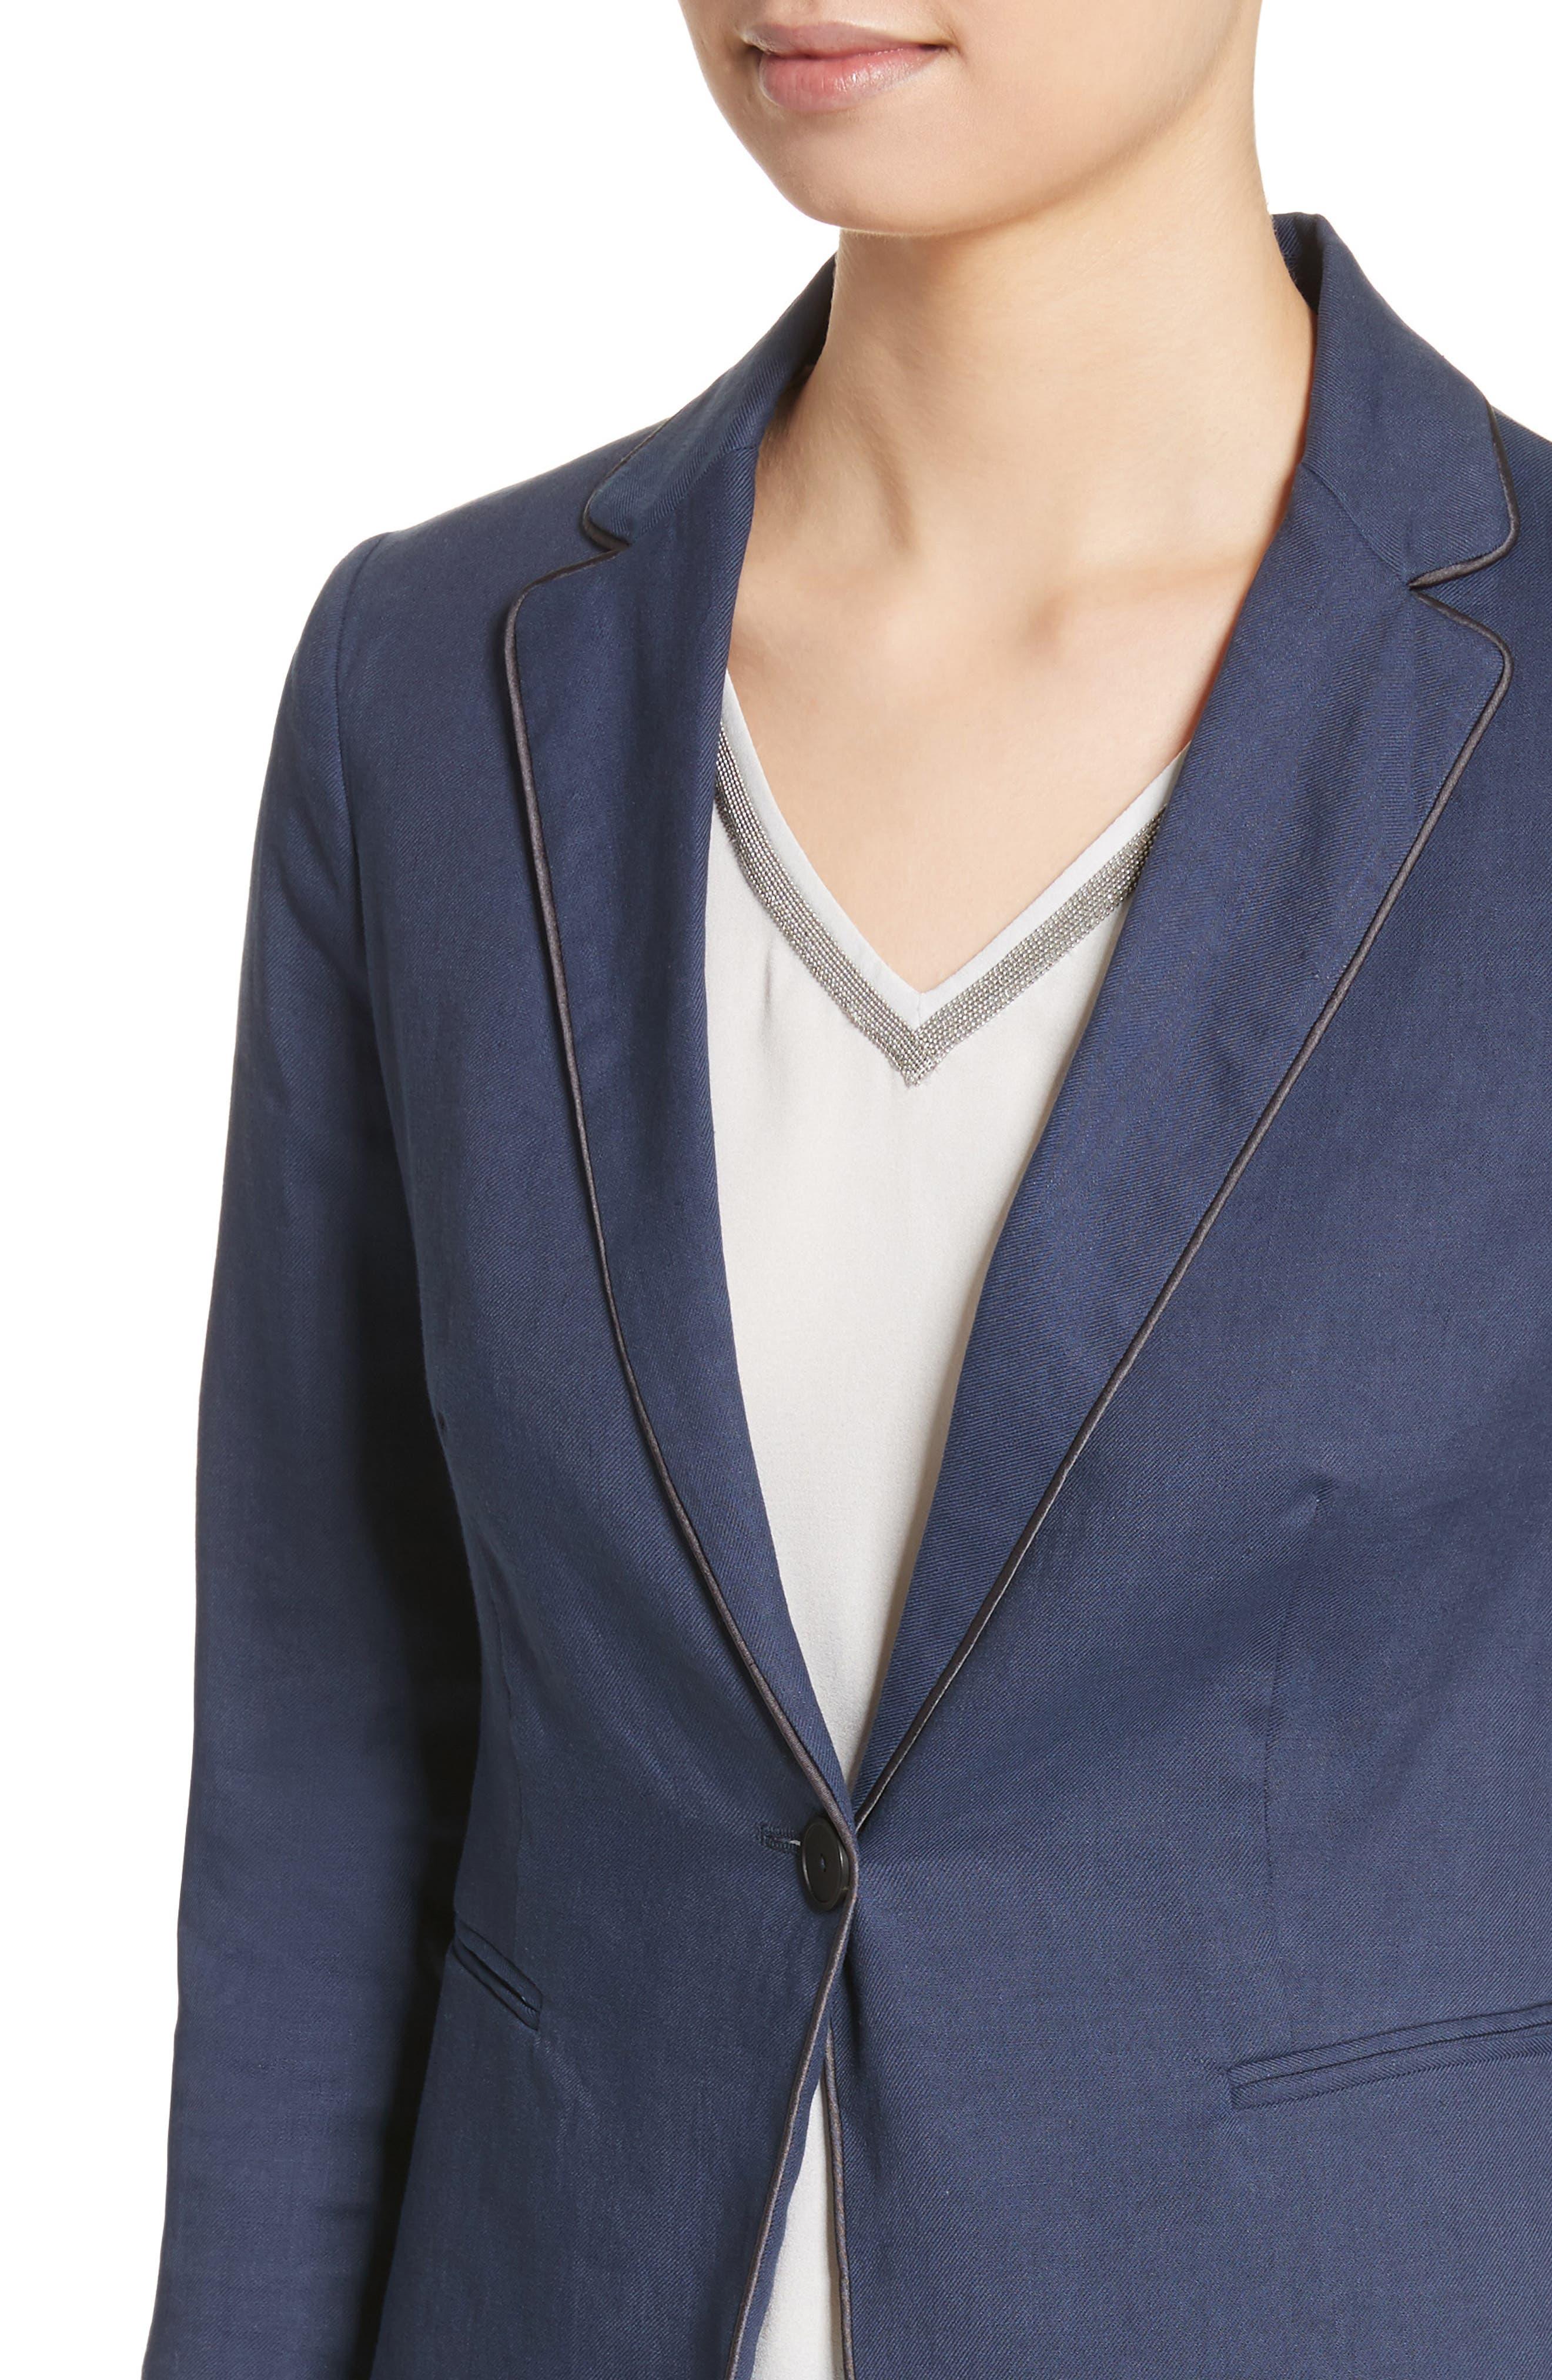 Piped Linen & Cotton Blend Blazer,                             Alternate thumbnail 4, color,